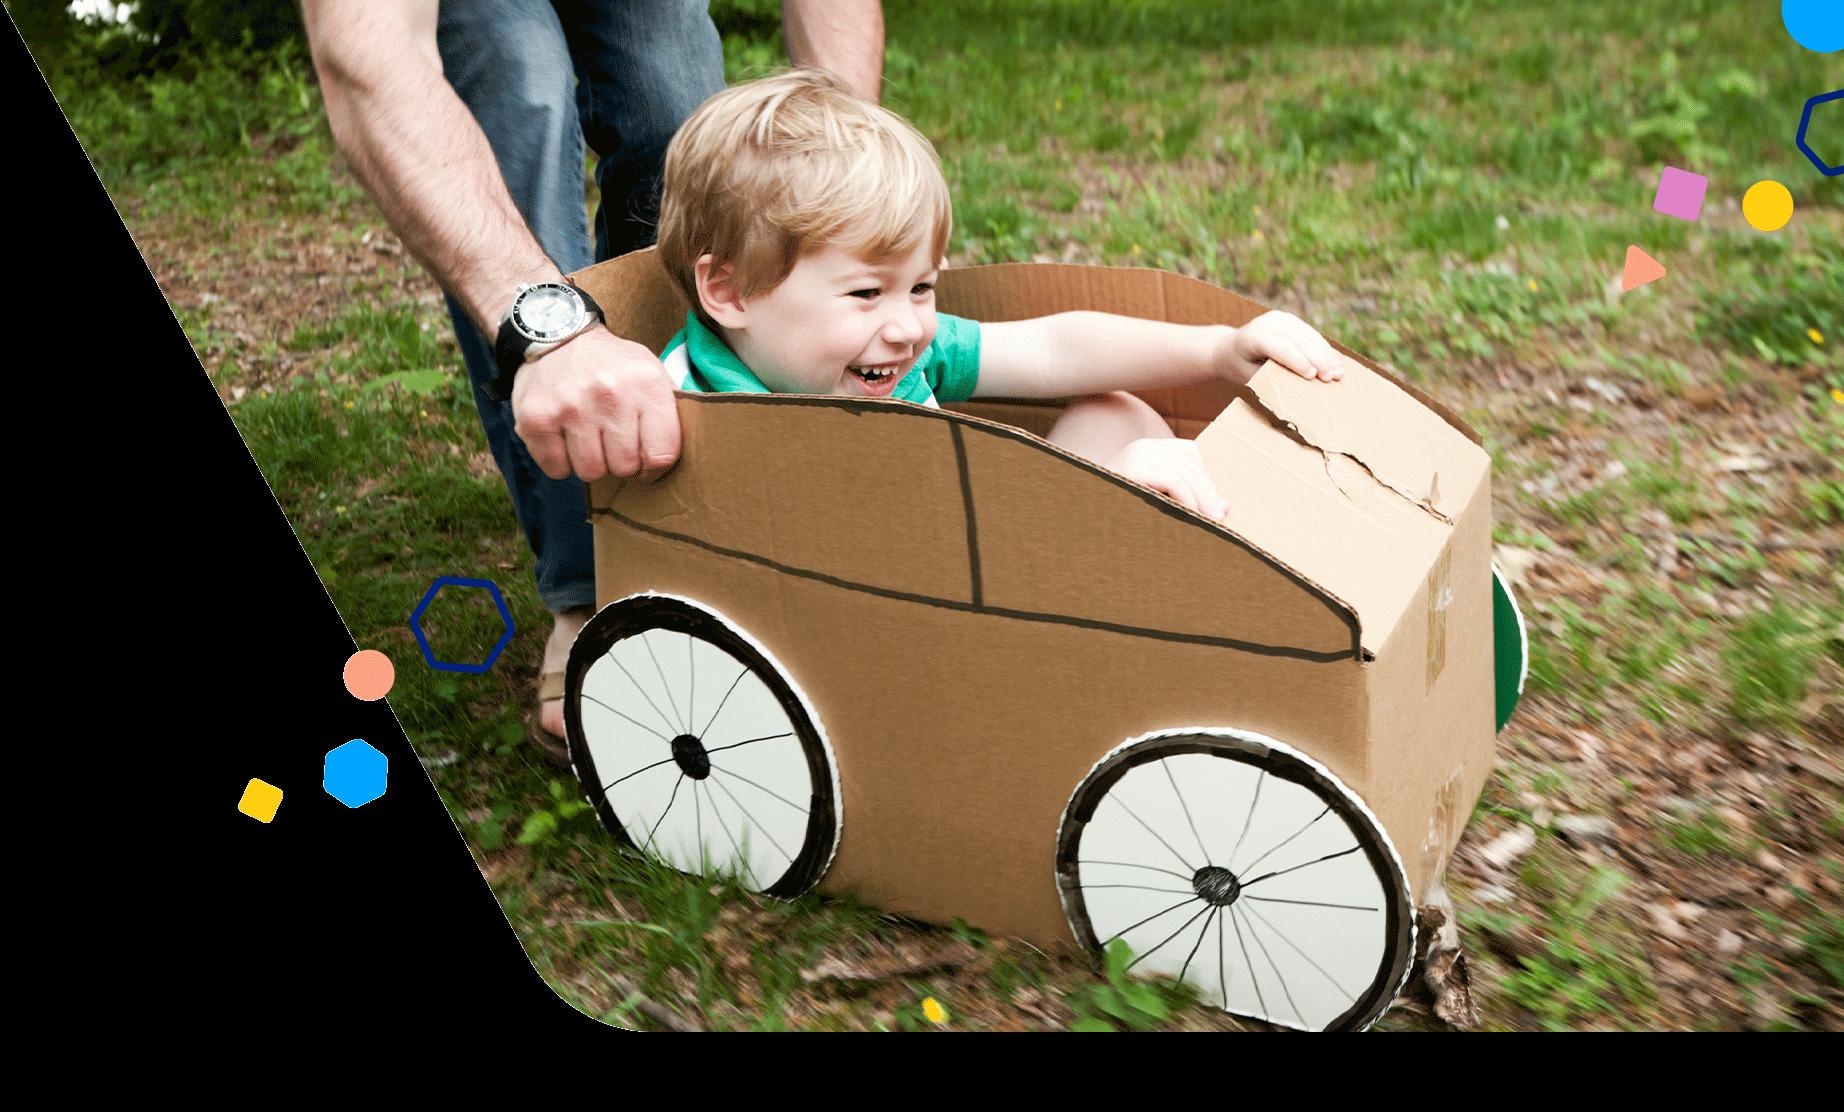 toddler-speech-development-creative-activities-toddlers